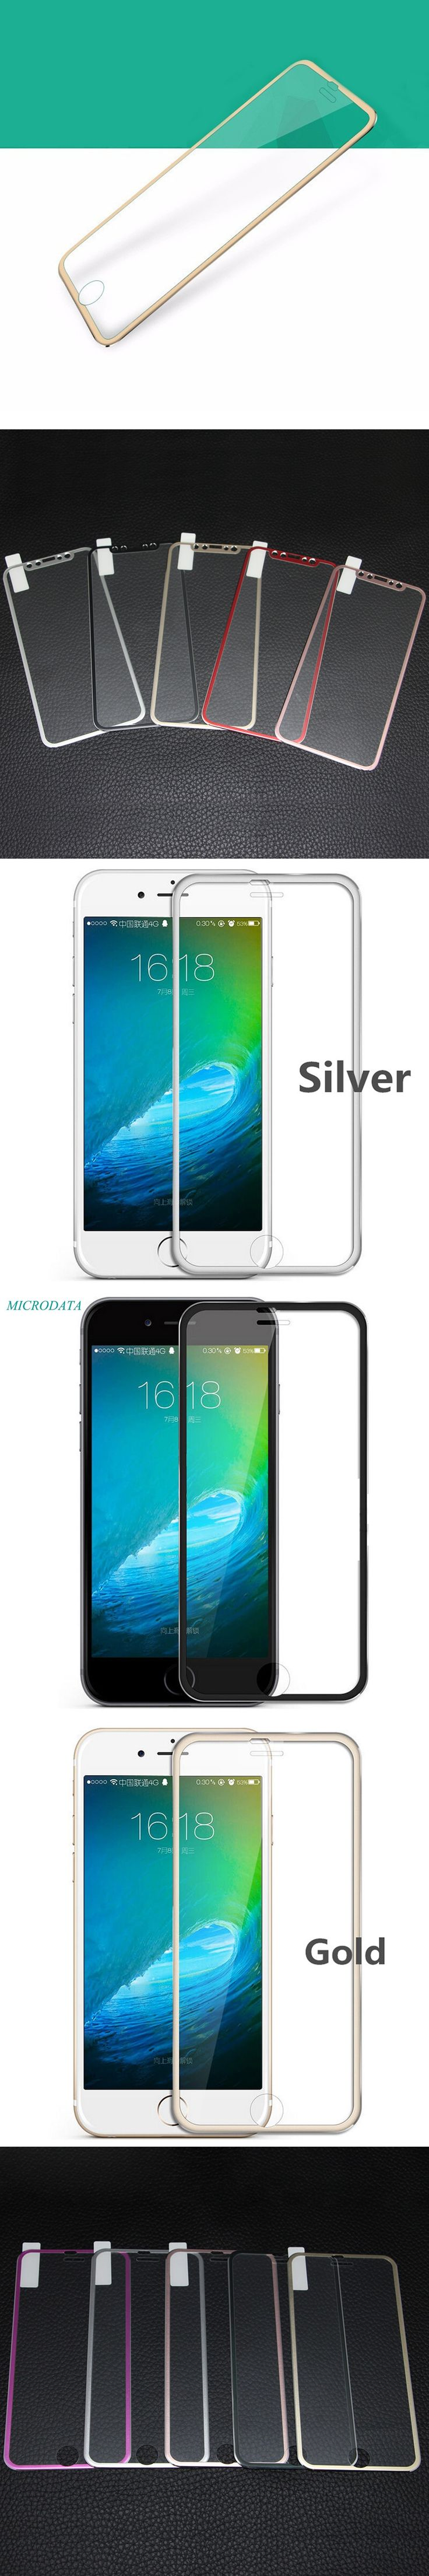 MicroData Titanium Alloy Metal Frame screen protector Tempered Glass Film guard defender border saver For iPhone 7 plus 6 s